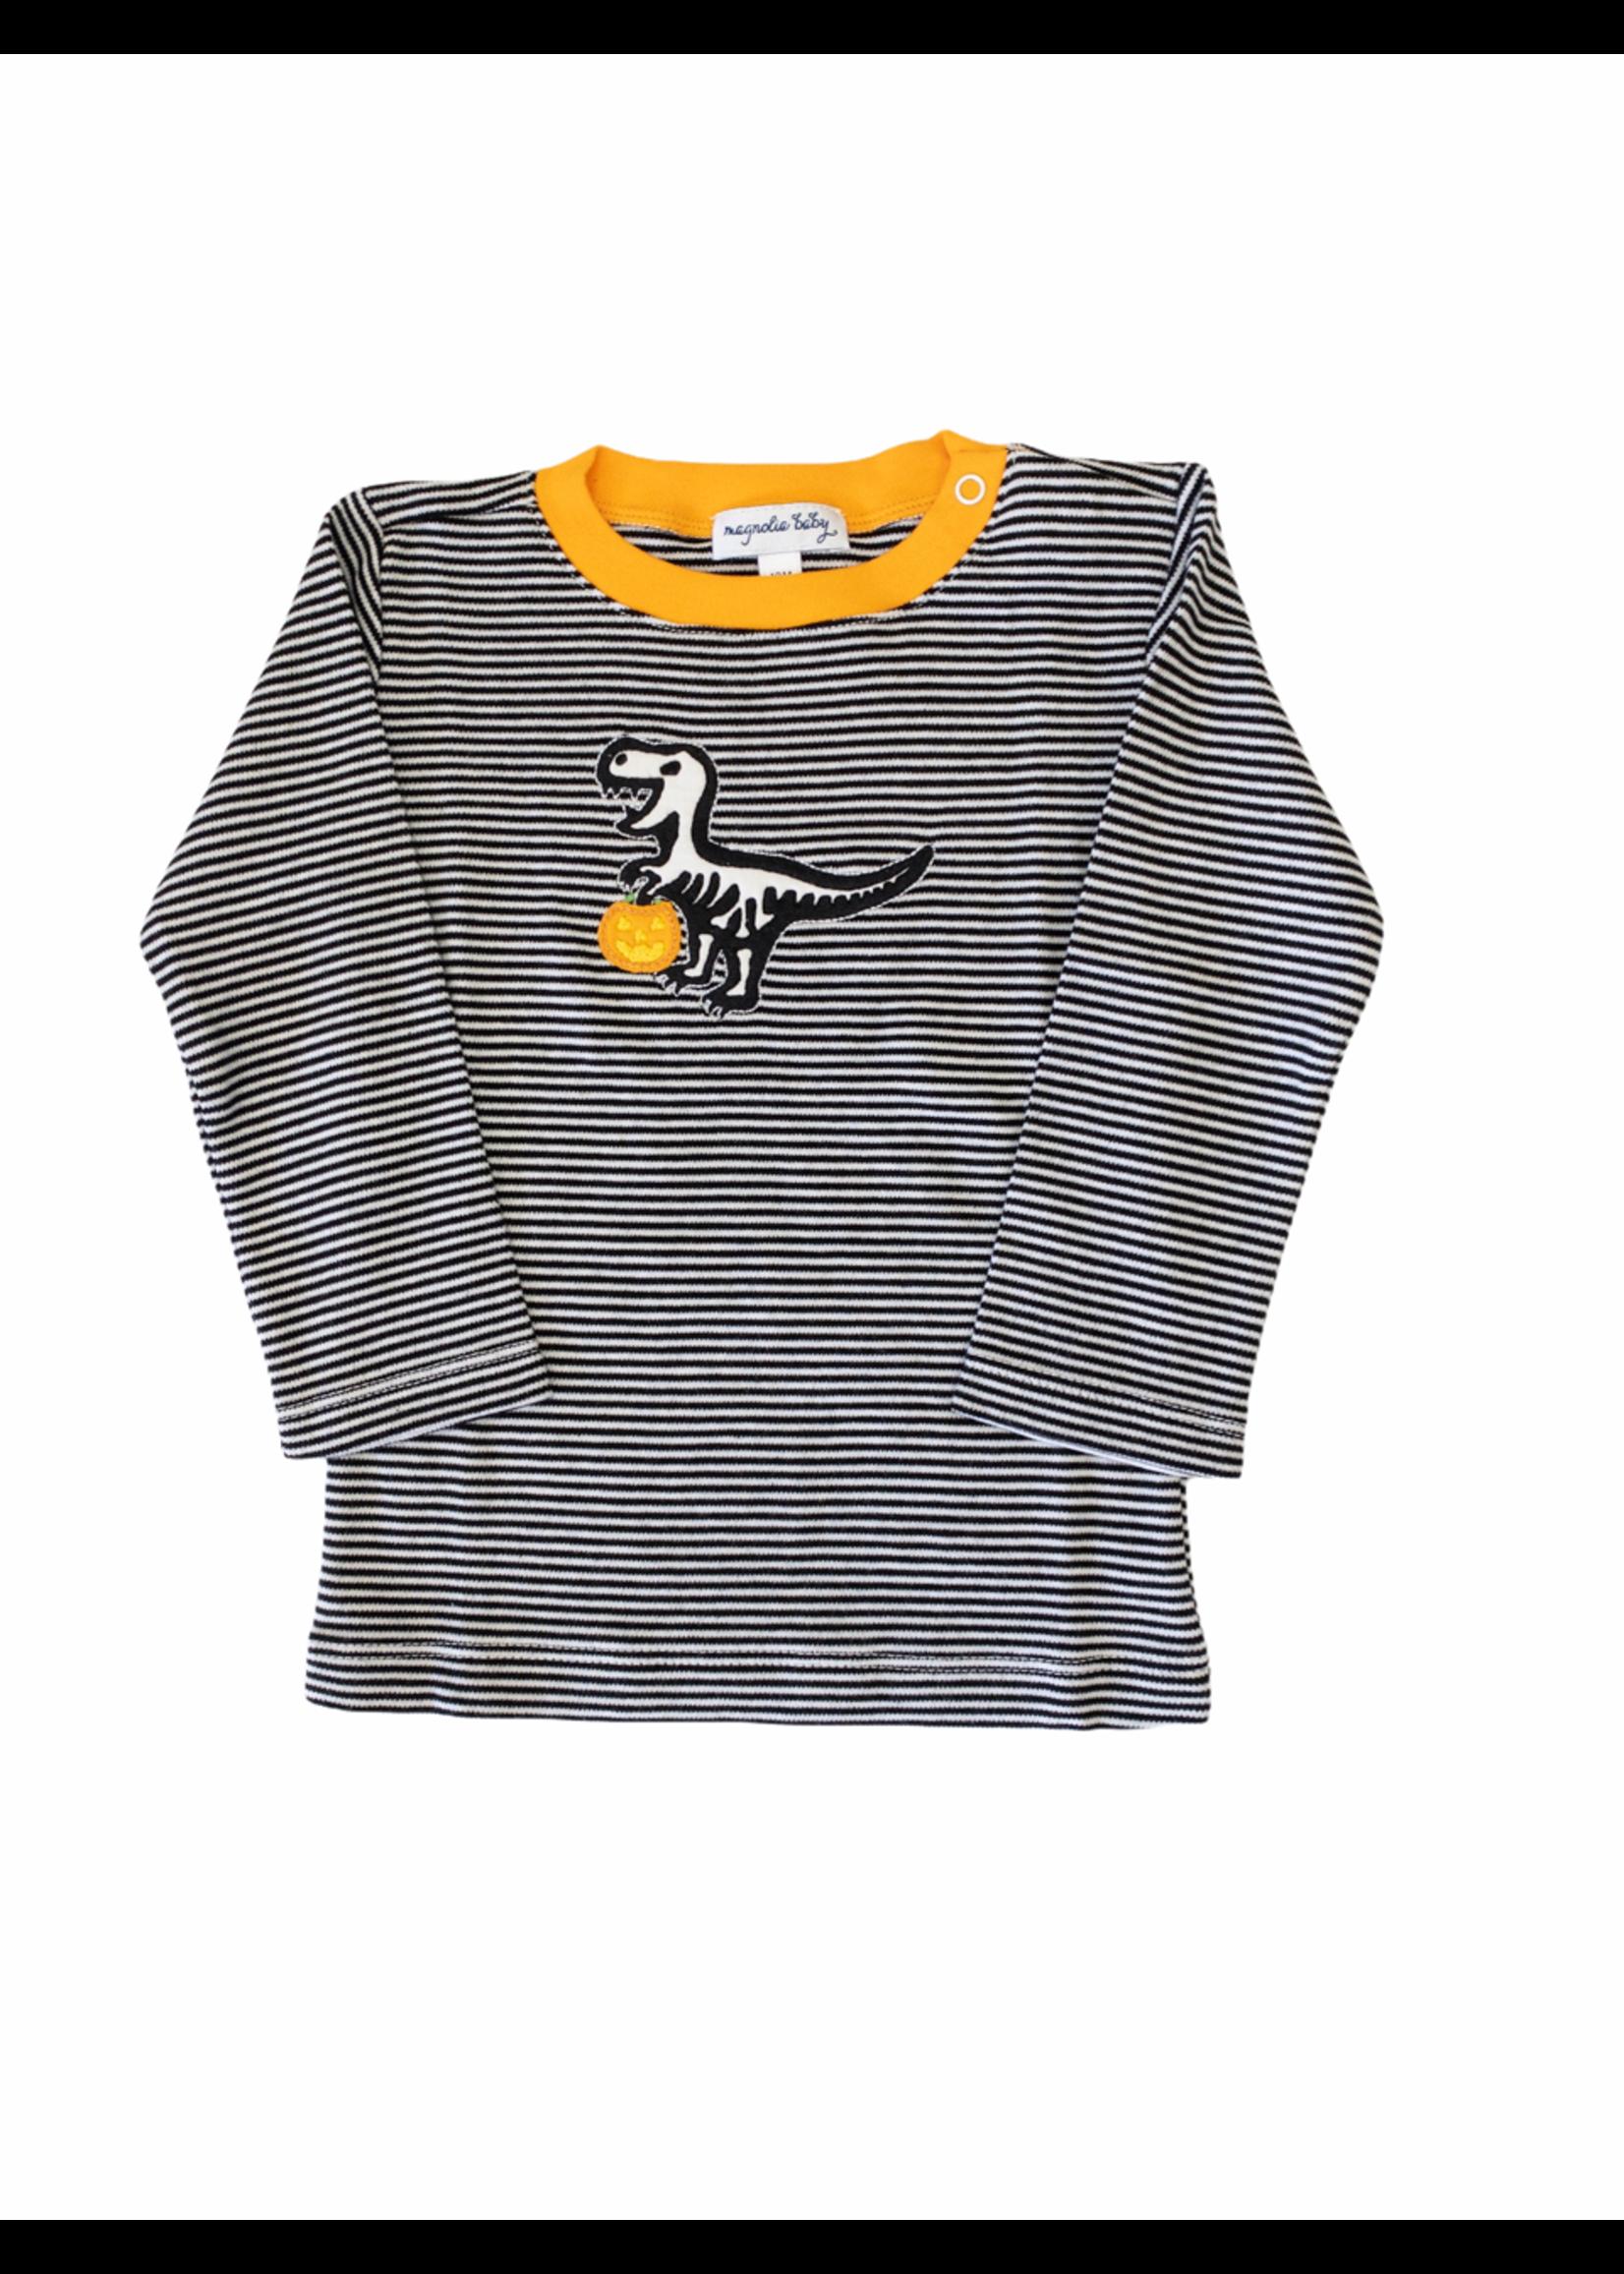 Magnolia Baby Dino Skeleton L/S T-Shirt